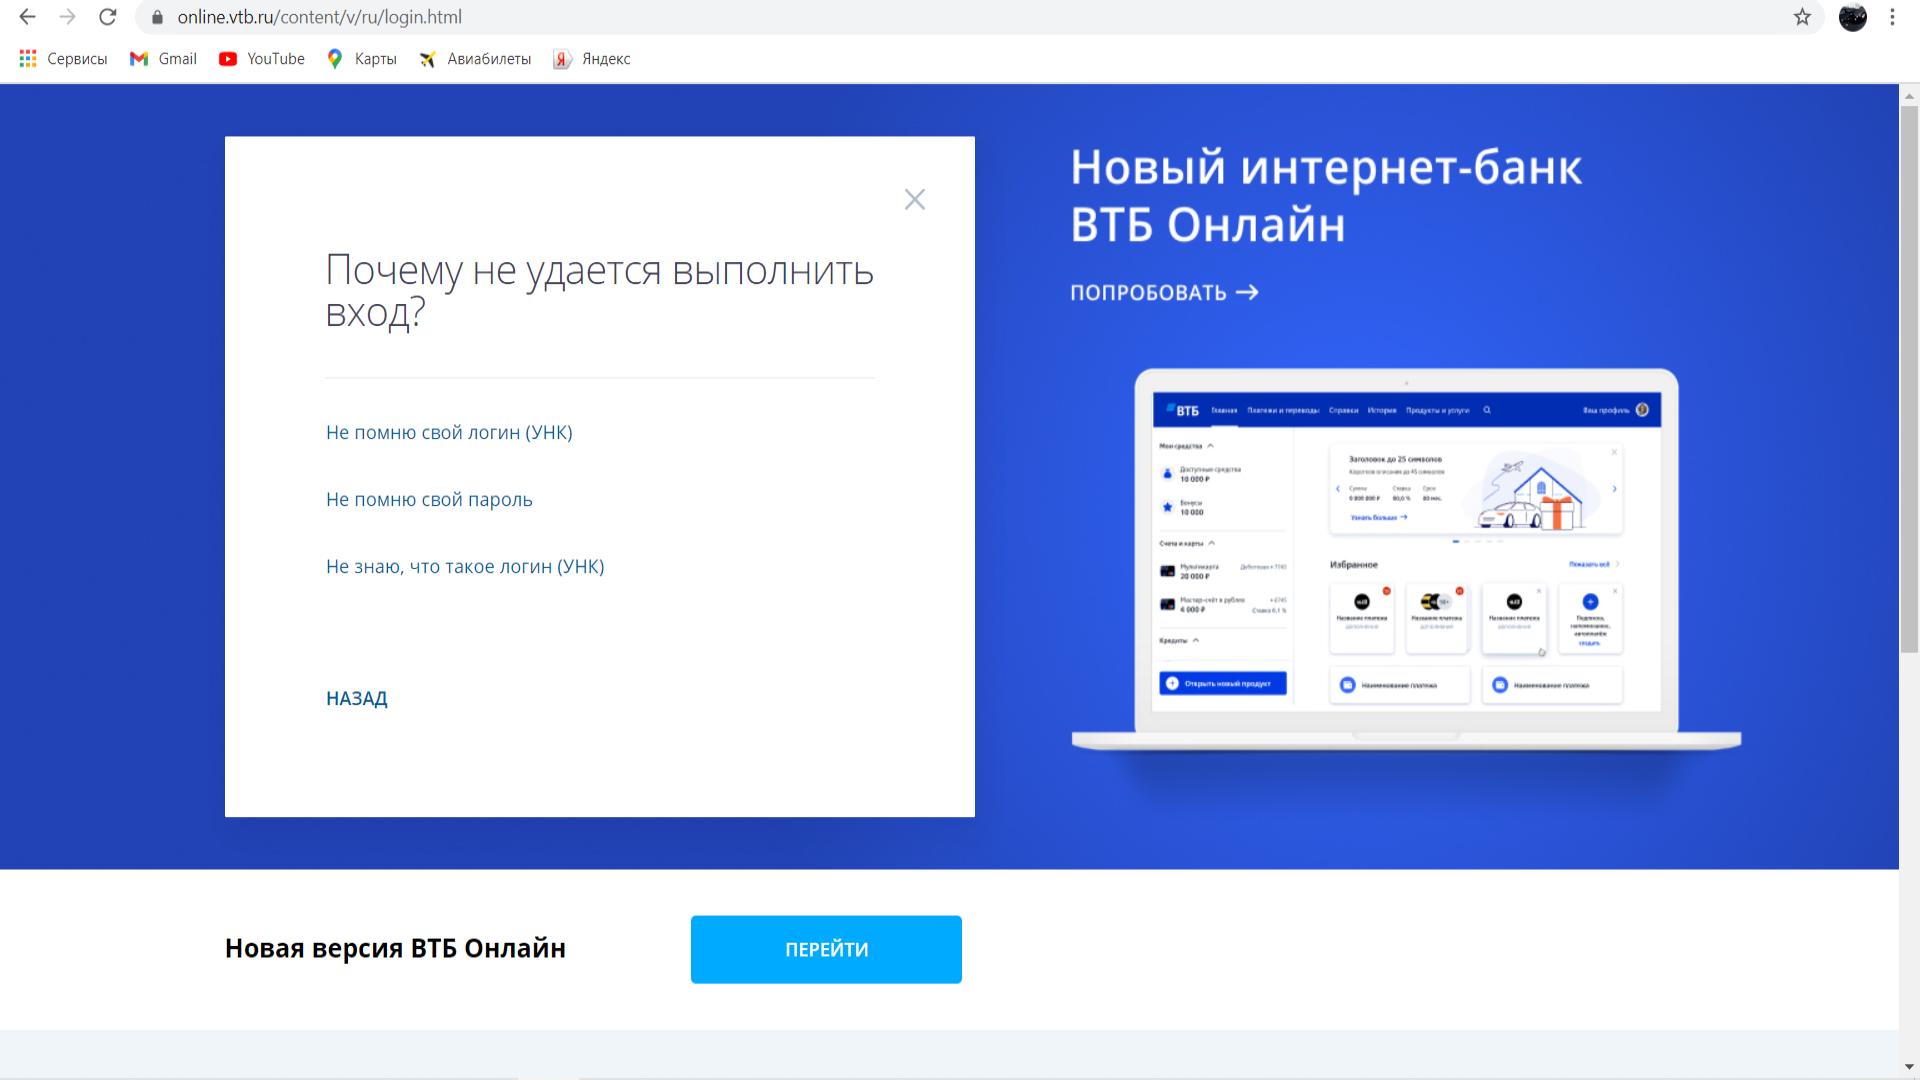 восстановление пароля от лк банк москва